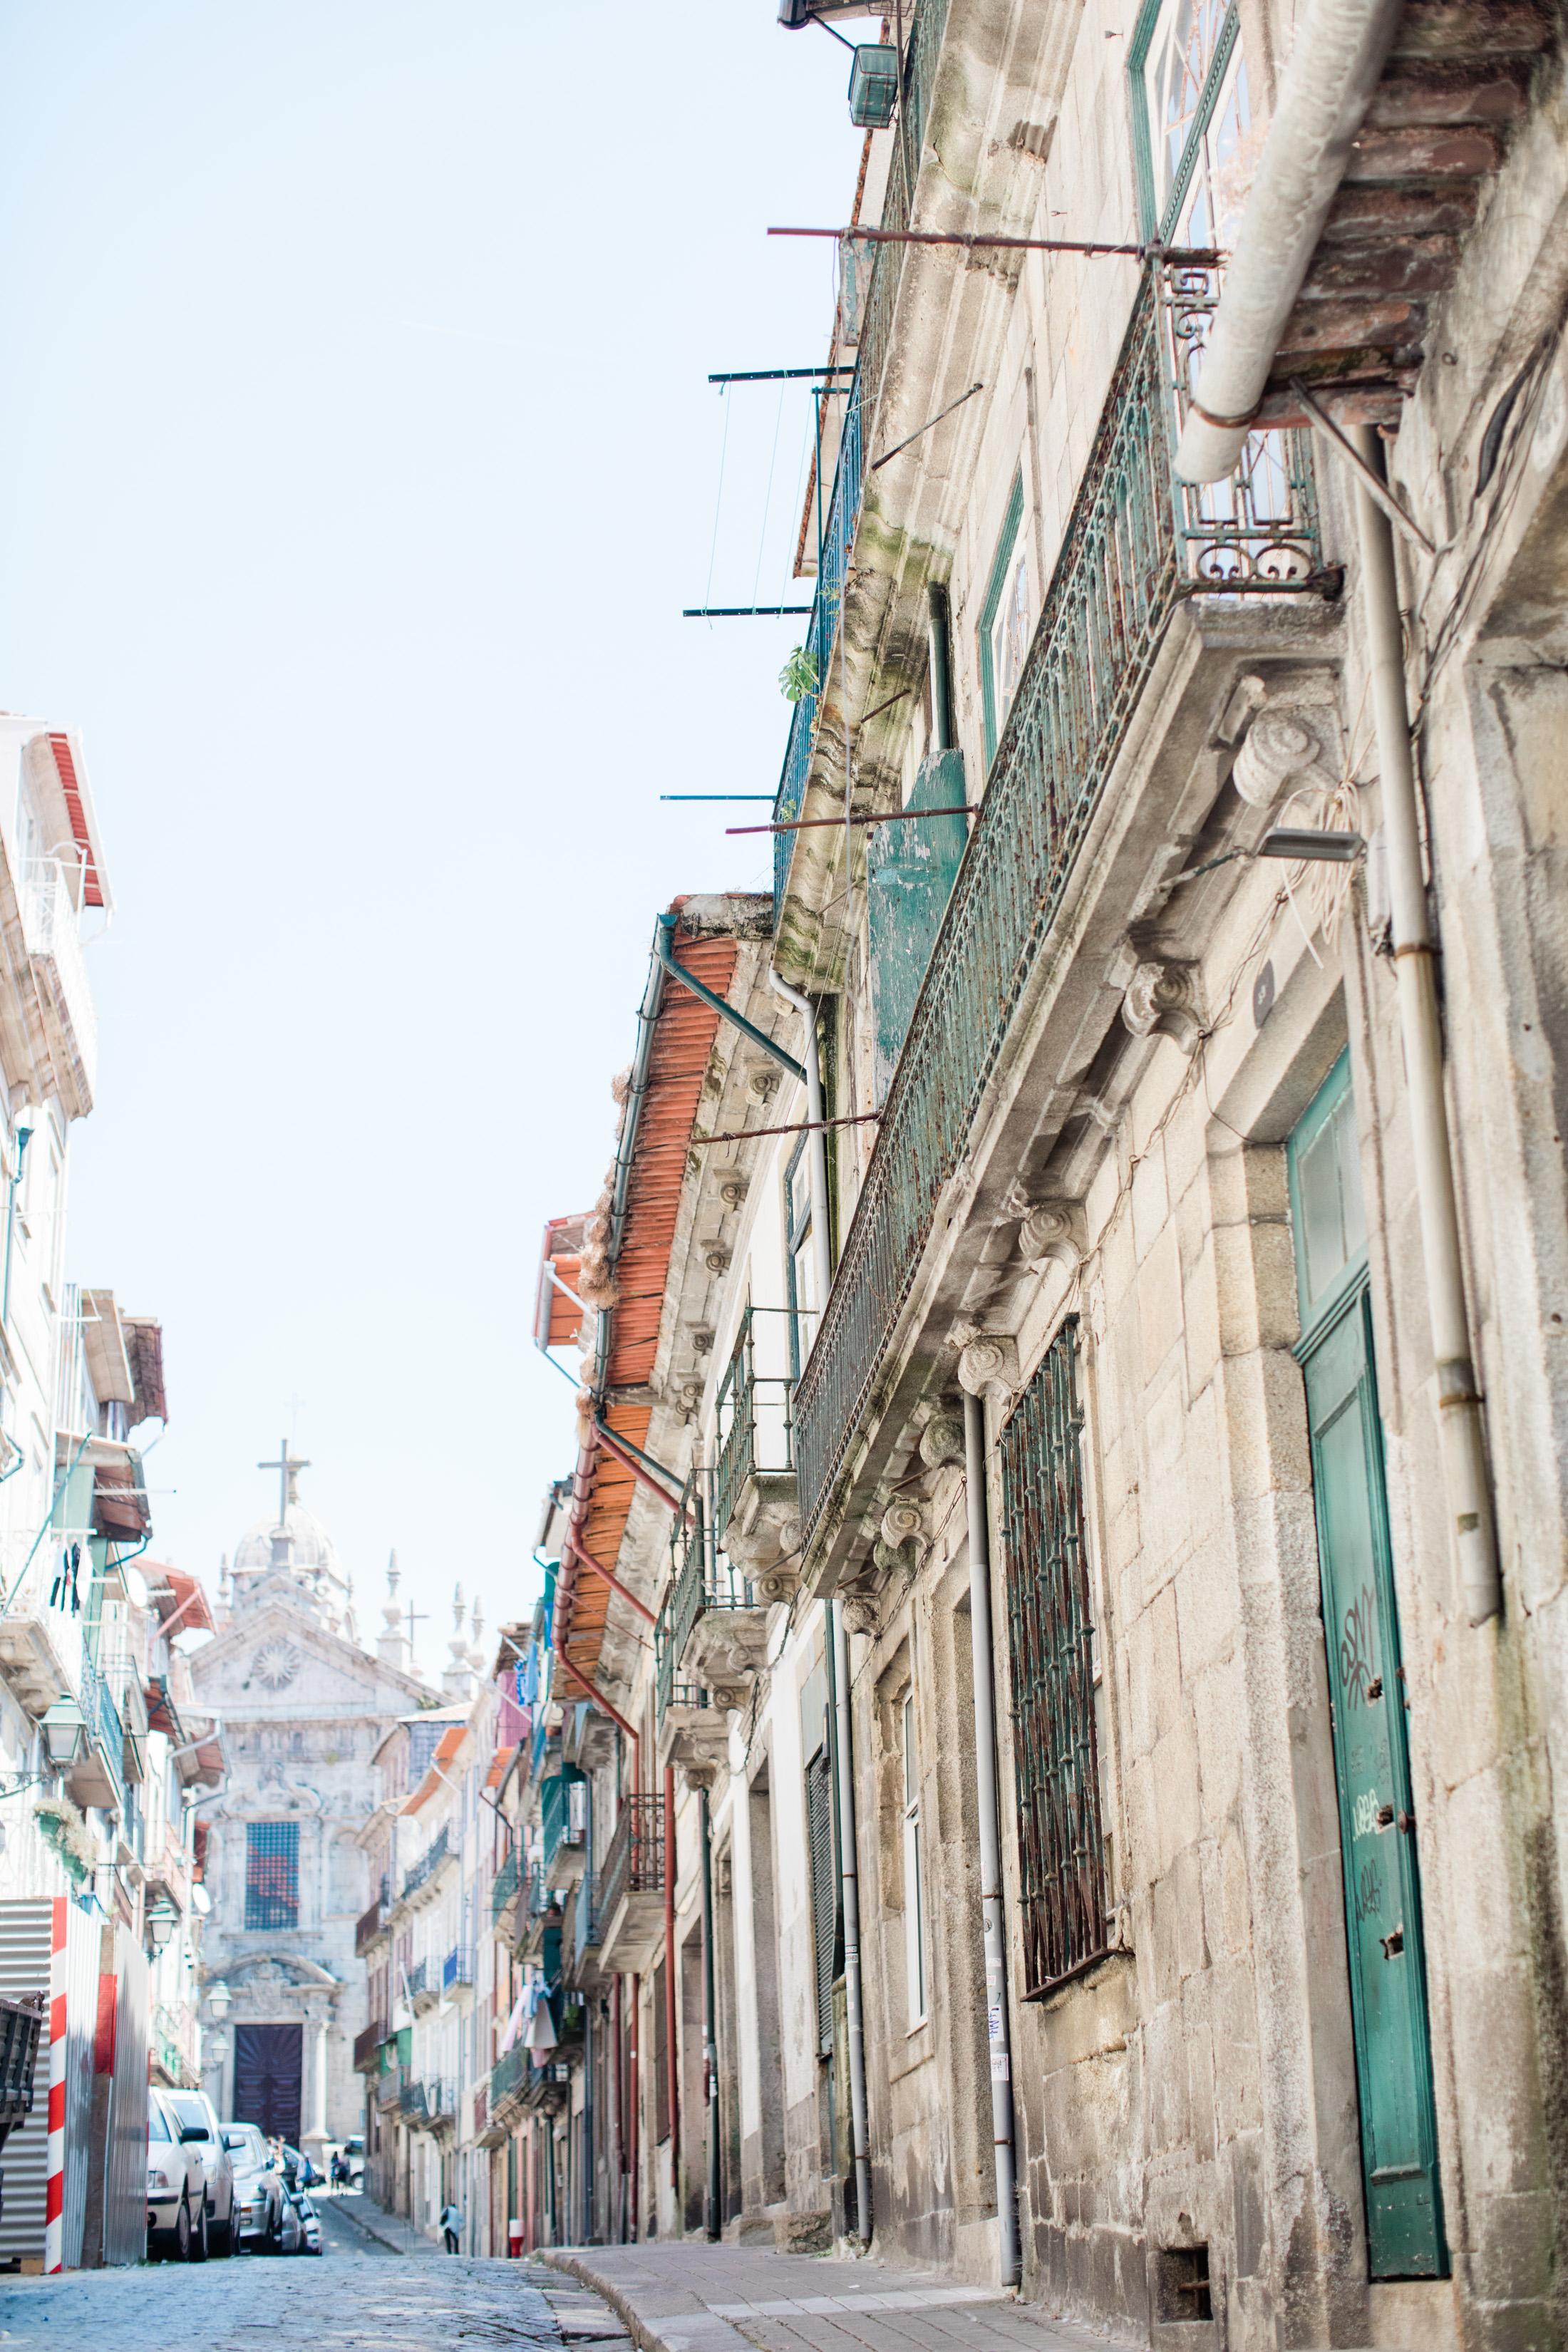 PortoPortugal_August2018-5.jpg